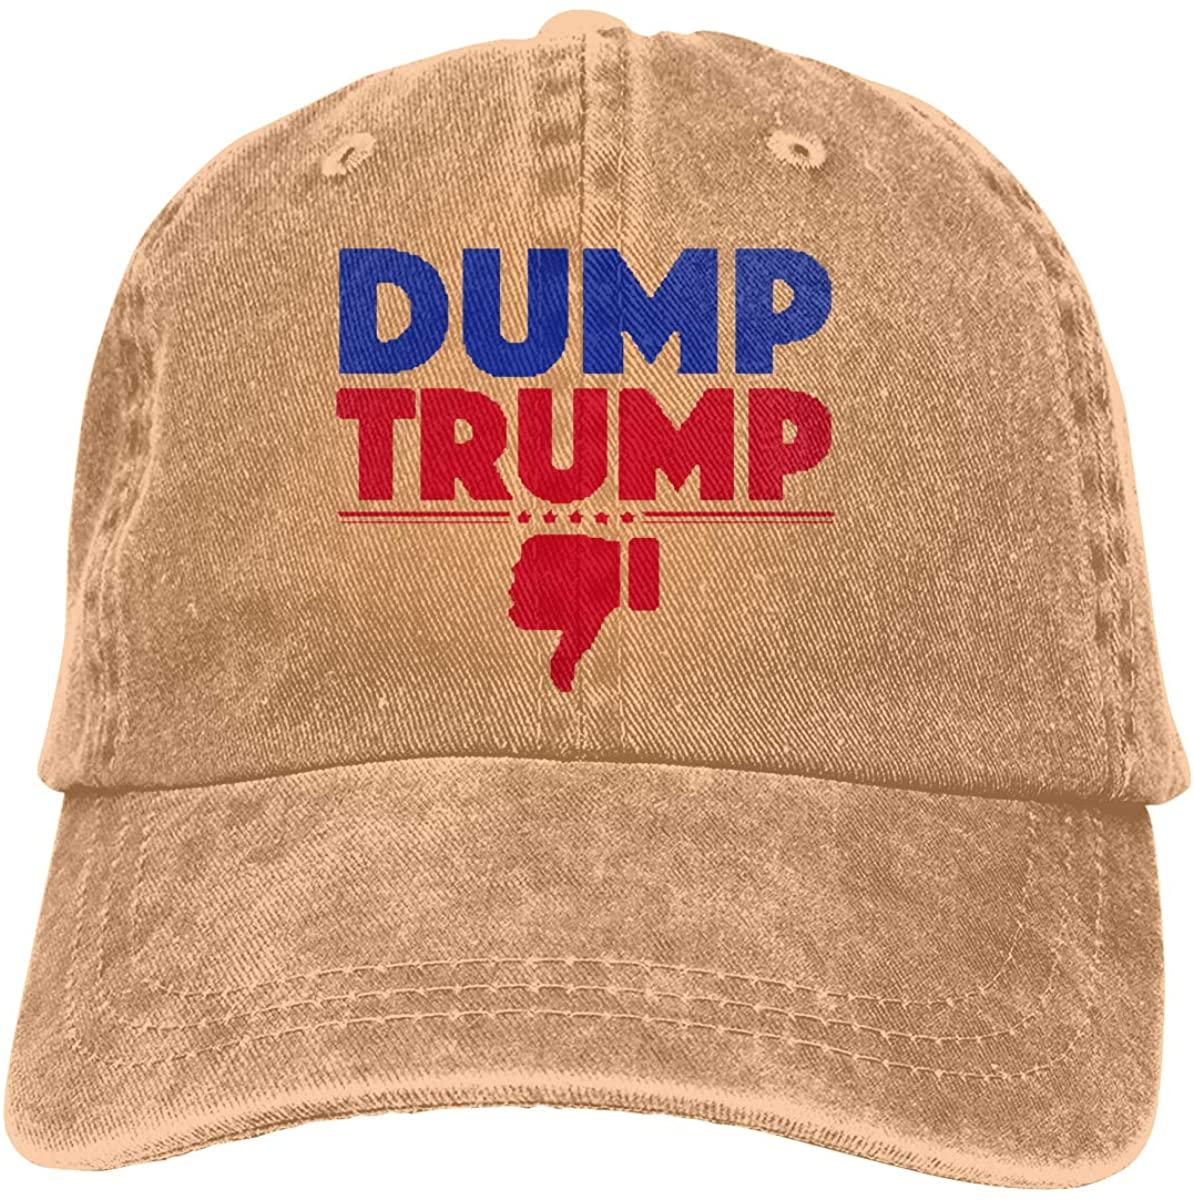 Classic Dump Trump - Flush The Turd November 3rd Adult Adjustable Denim Cowboy Hat